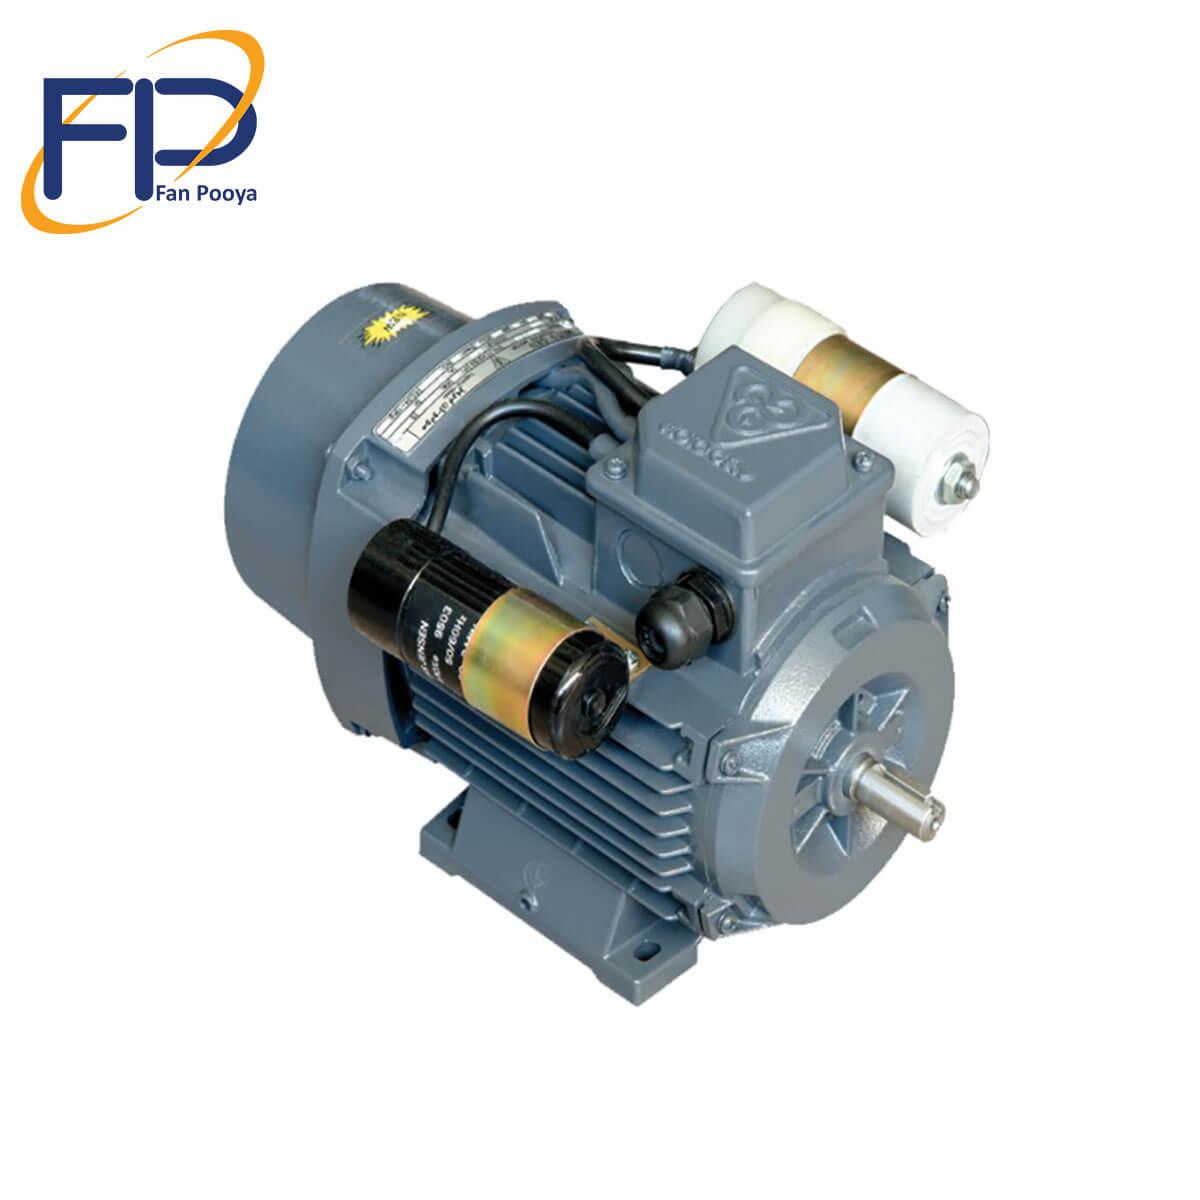 الکتروموتورموتوژن تک فازخازن استارت(CRS)تک دورقدرت1.5kwکیلو وات3000دور